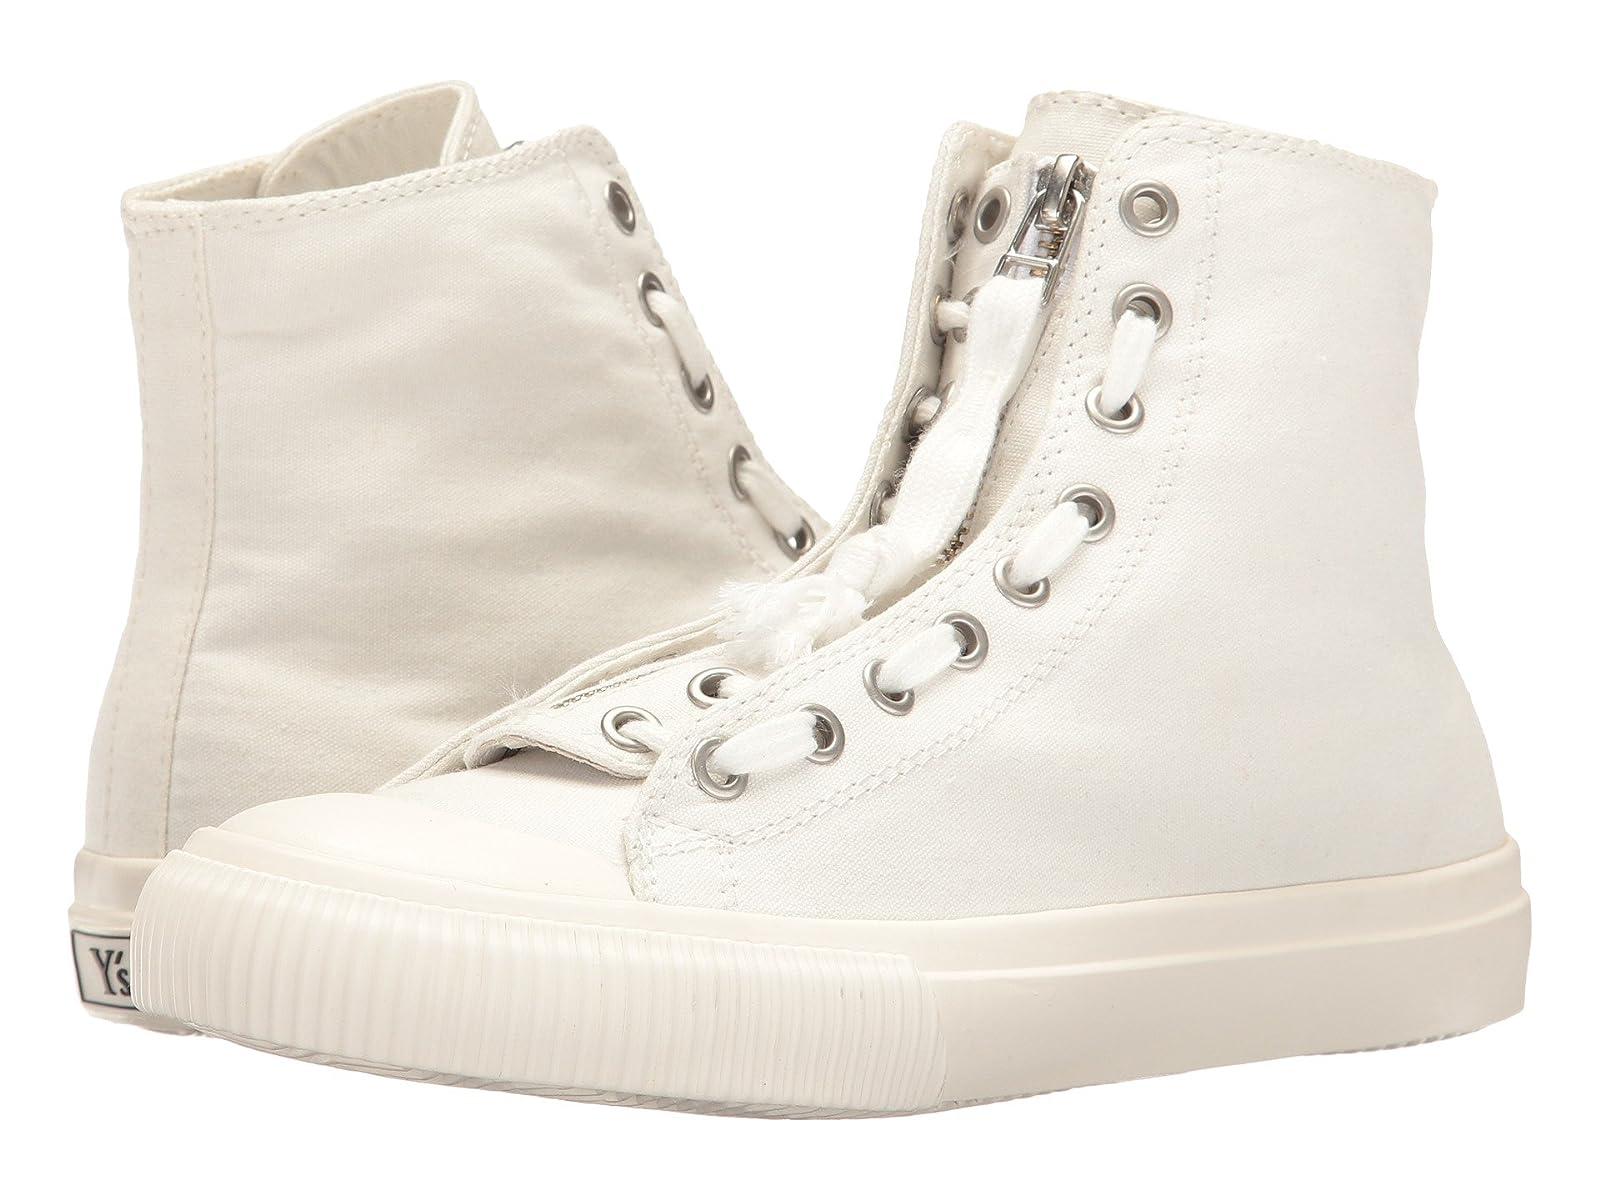 Y's by Yohji Yamamoto Parachute High-CutCheap and distinctive eye-catching shoes